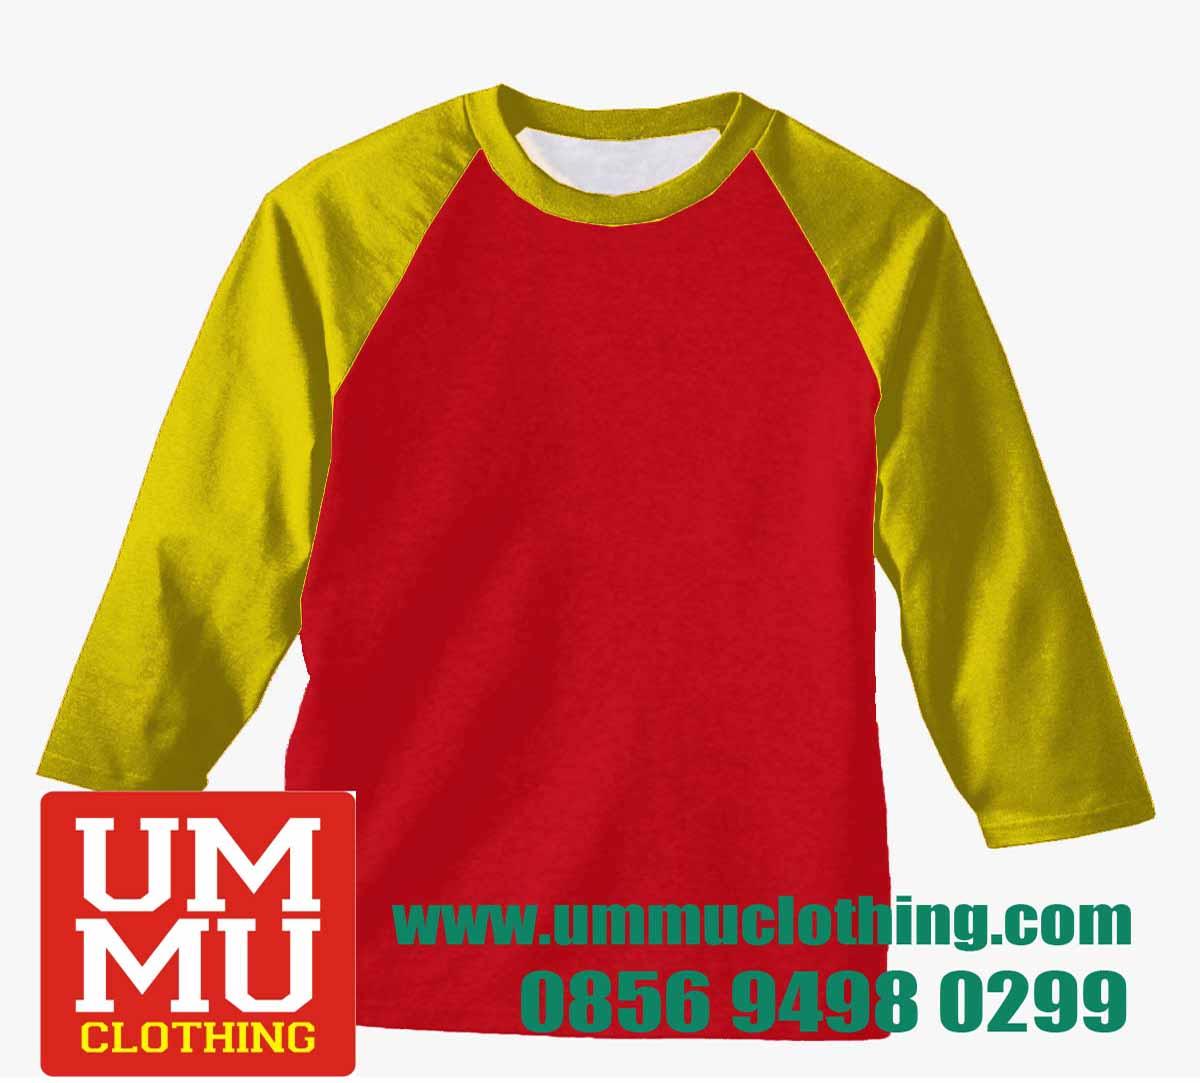 Kaos Polos Raglan Merah Kuning Ummu Gambar Warna